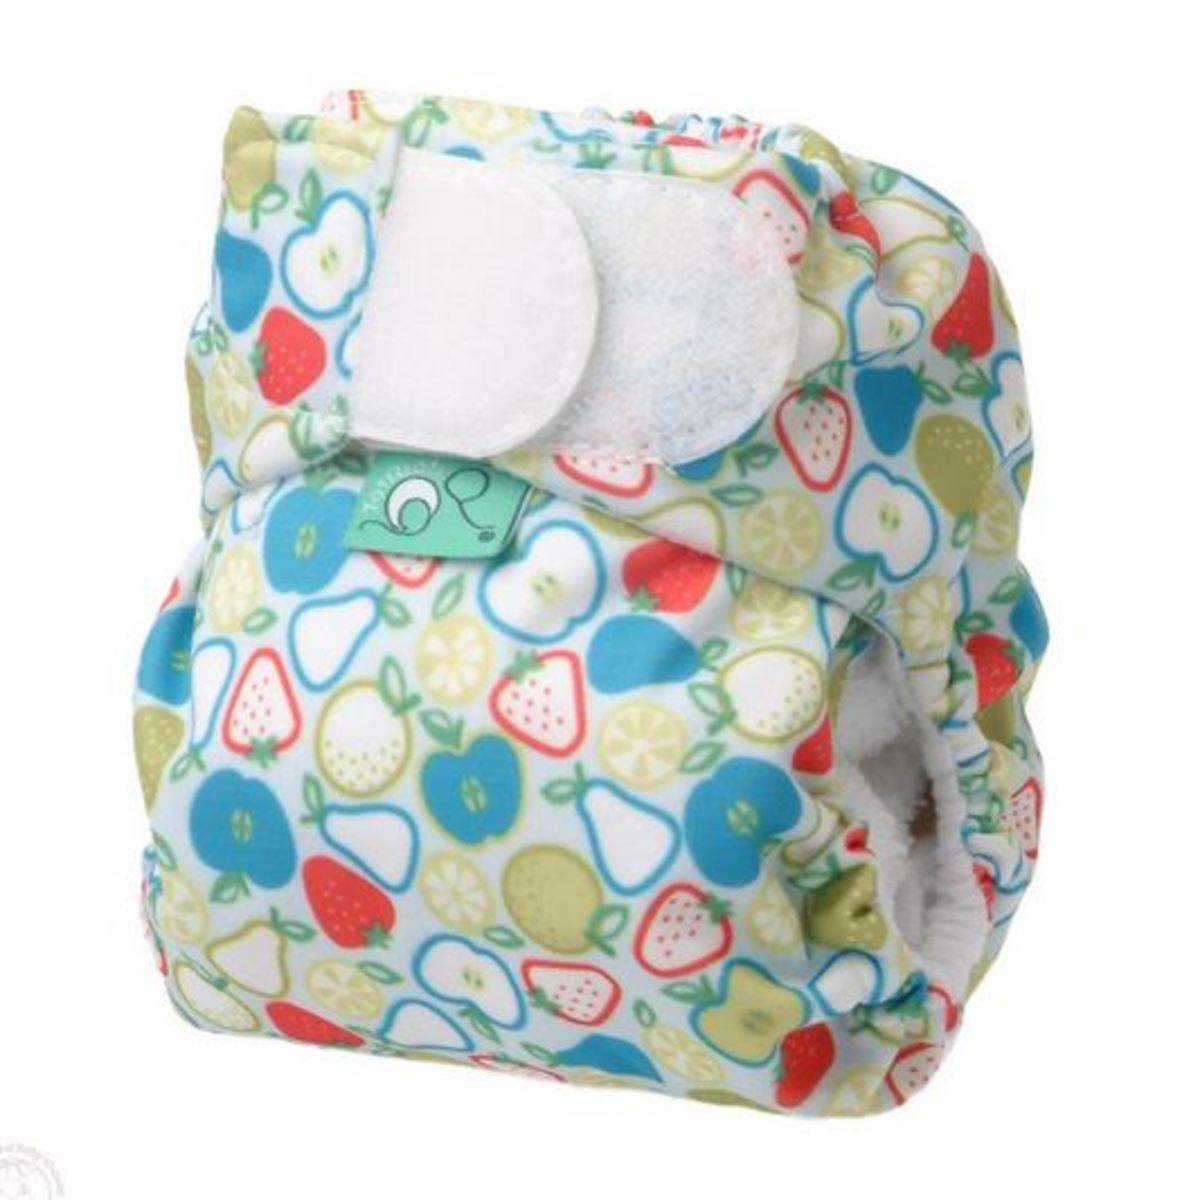 Tots Bots Tutti Frutti Print Diaper